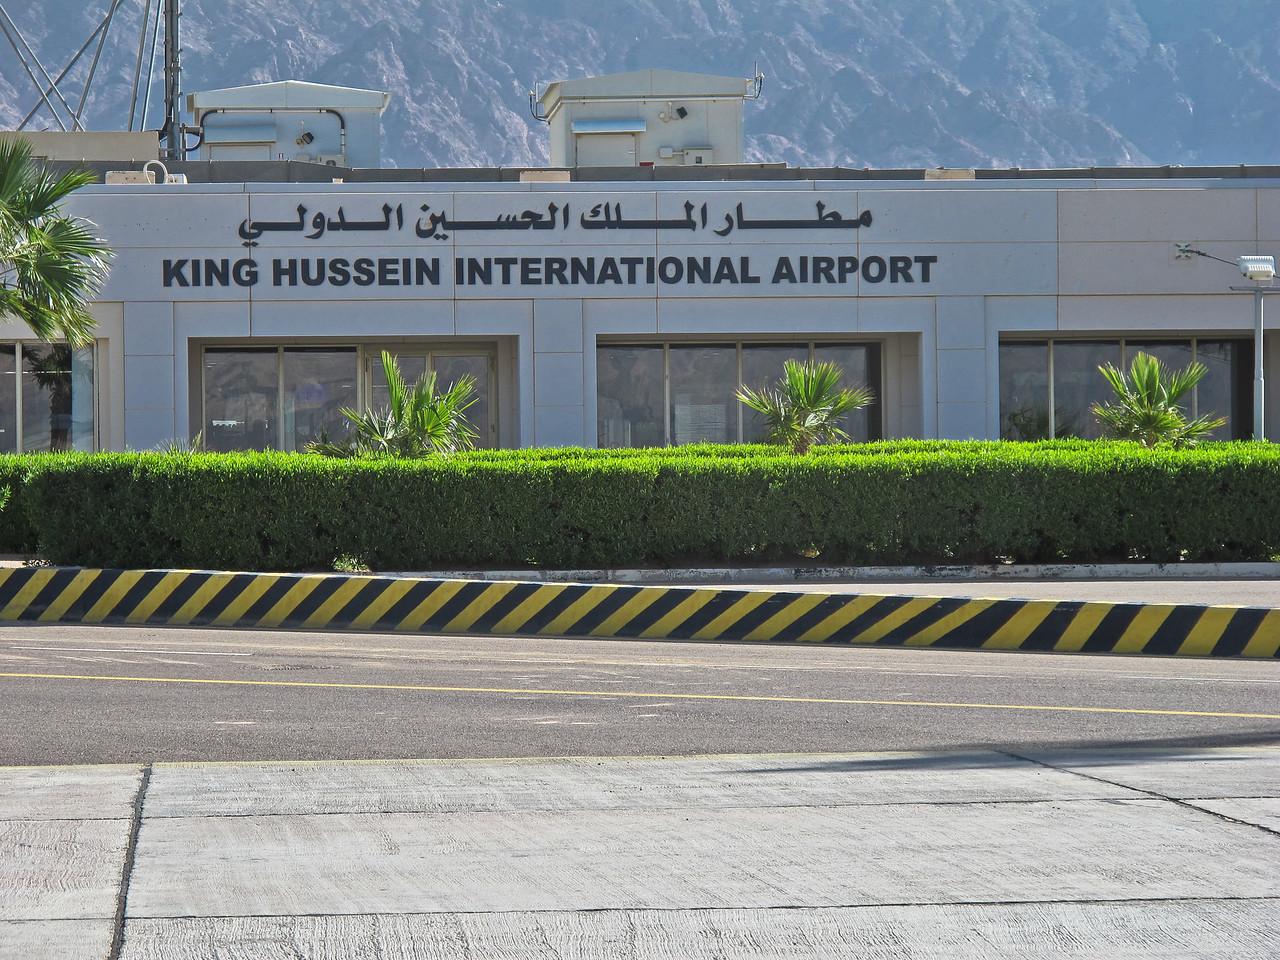 King Hussein International Airport, Aqaba, Jordan